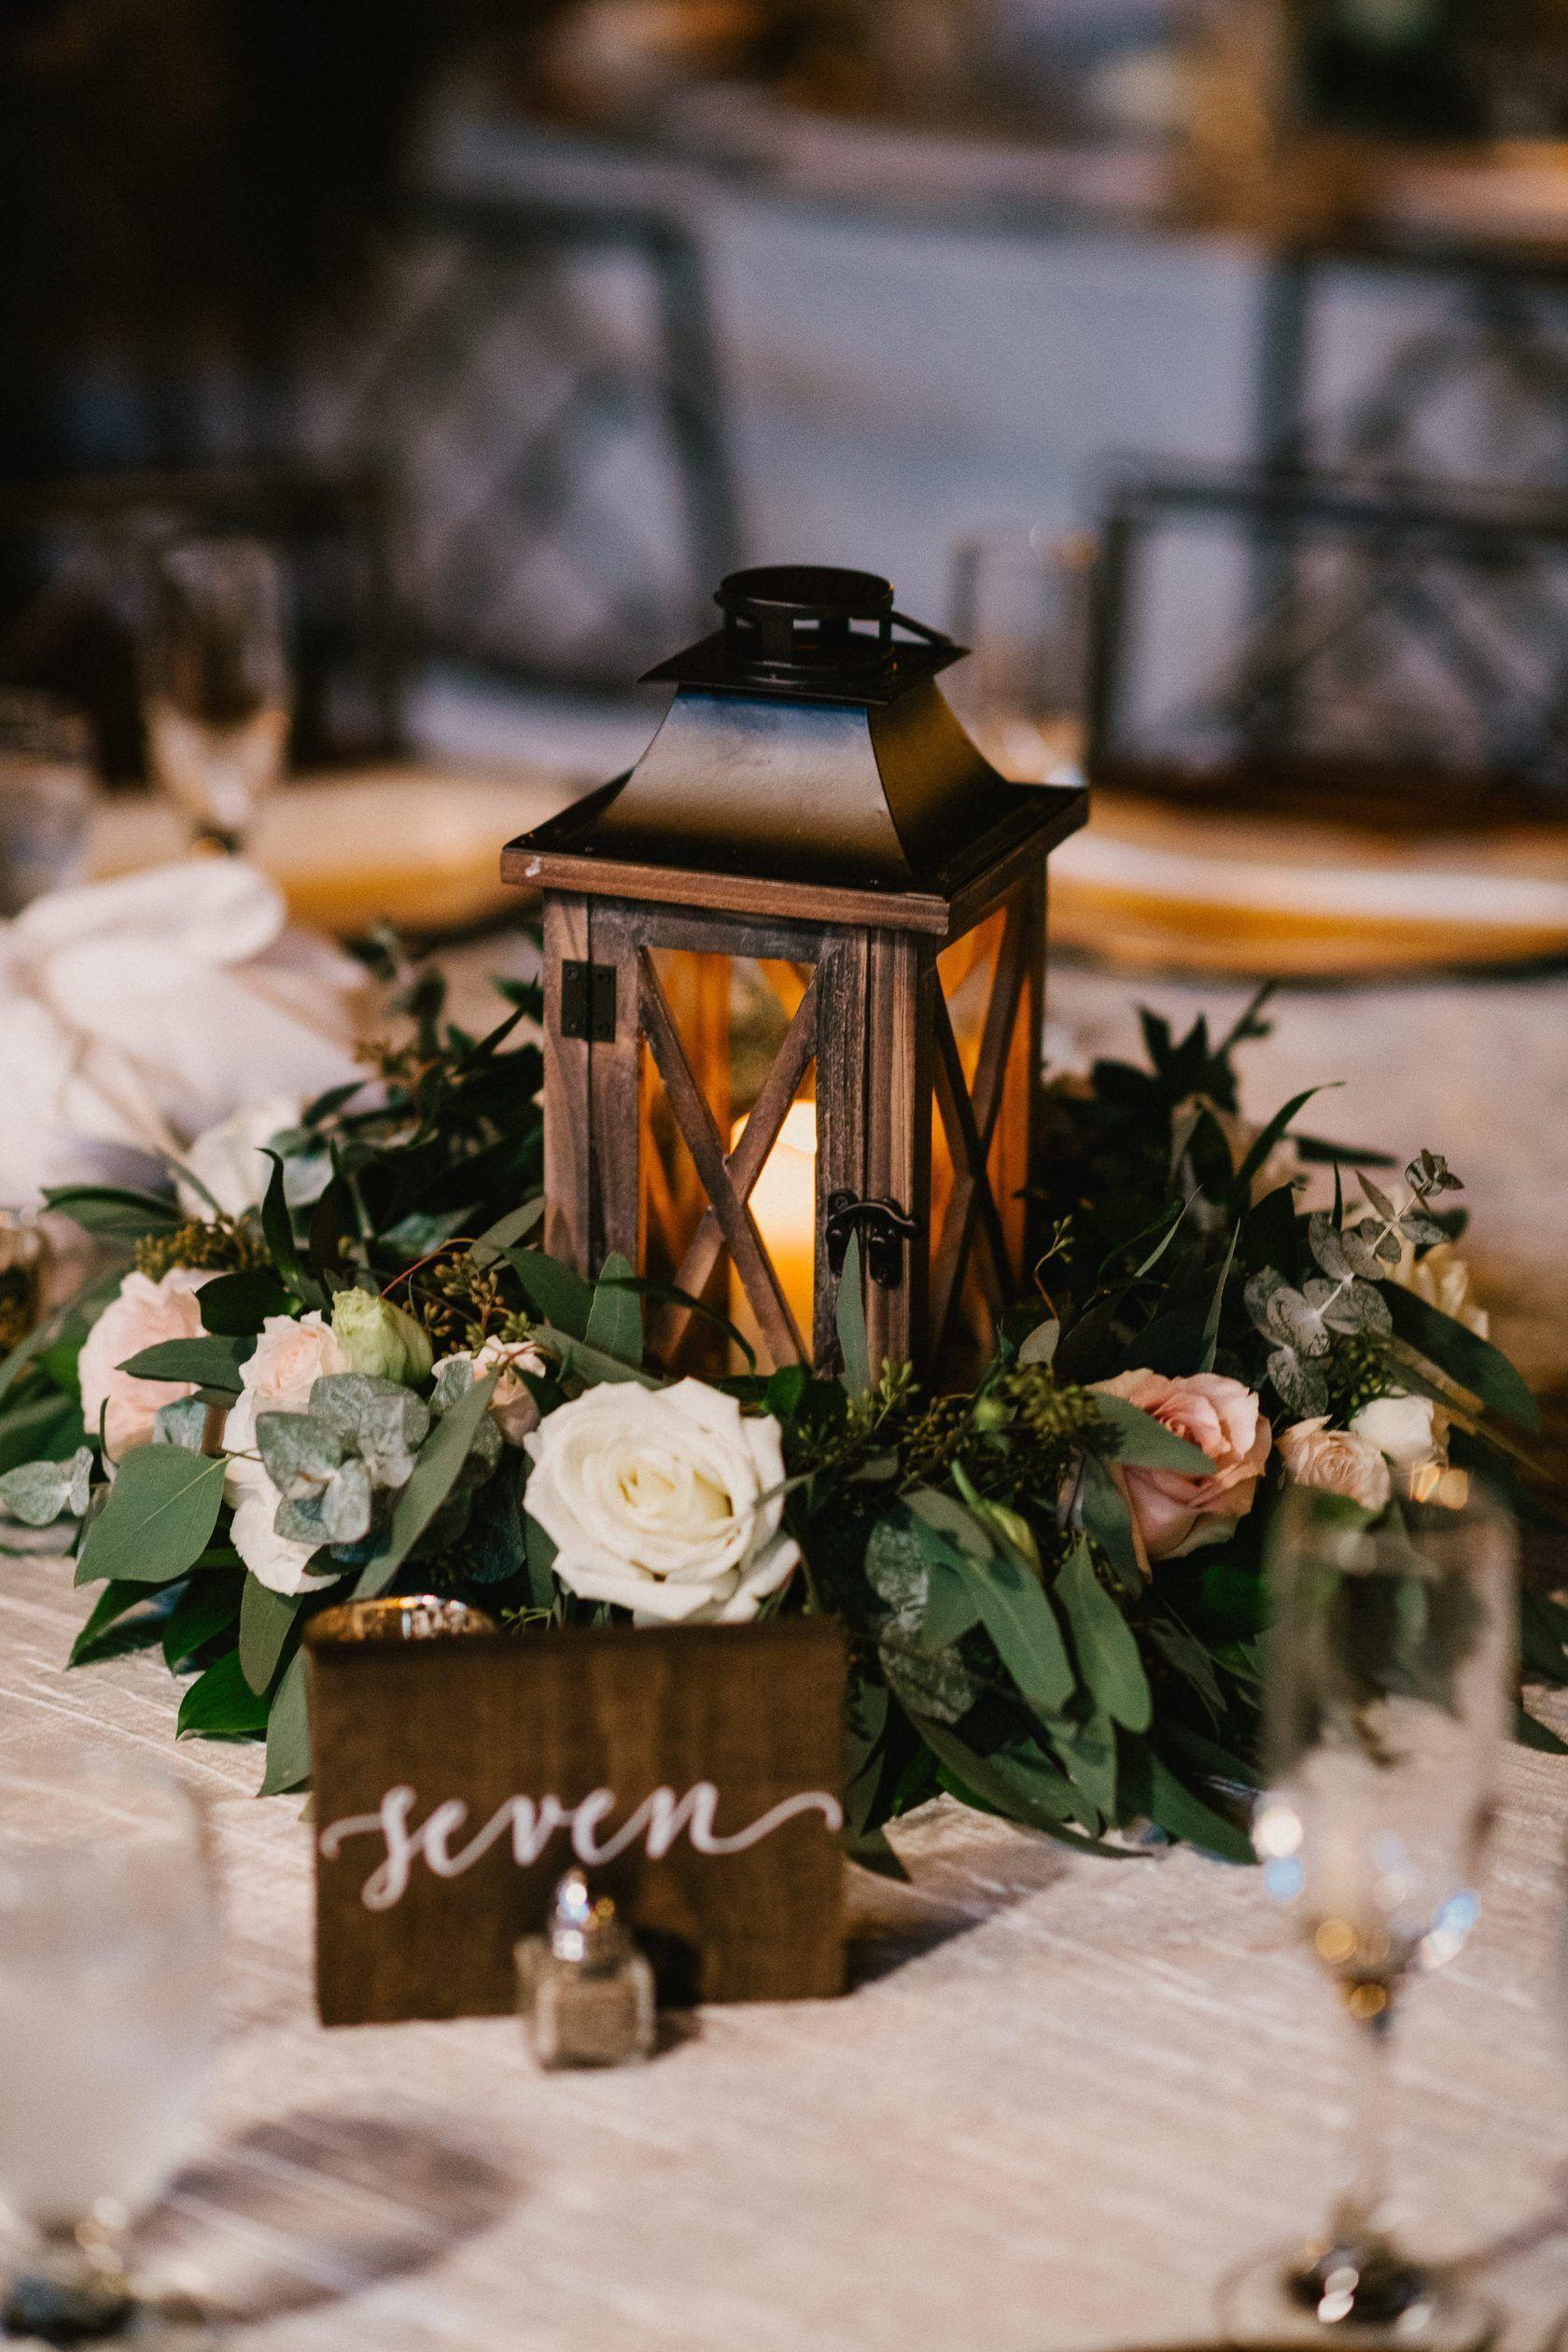 20 Greenery Filled Winter Wedding Ideas to Inspire - Elegantweddinginvites.com Blog